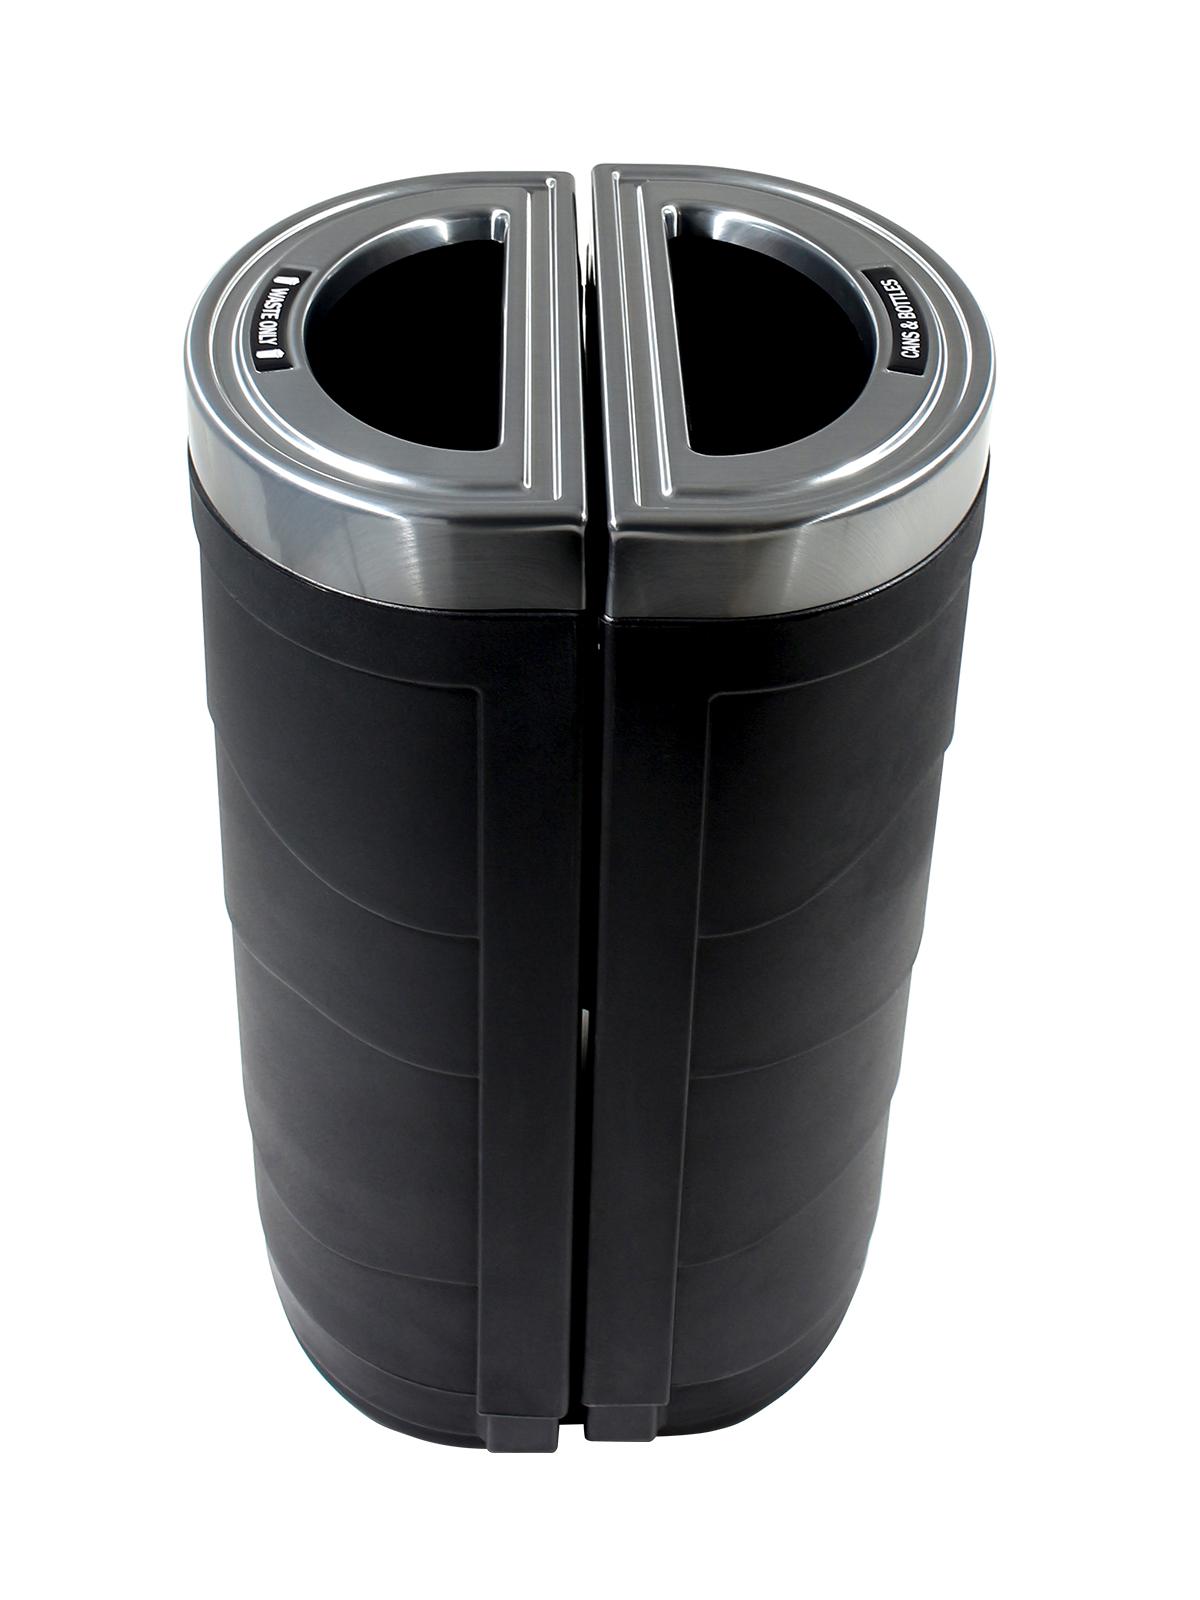 EVOLVE - Double - Cans & Bottles-Waste - Full - Black